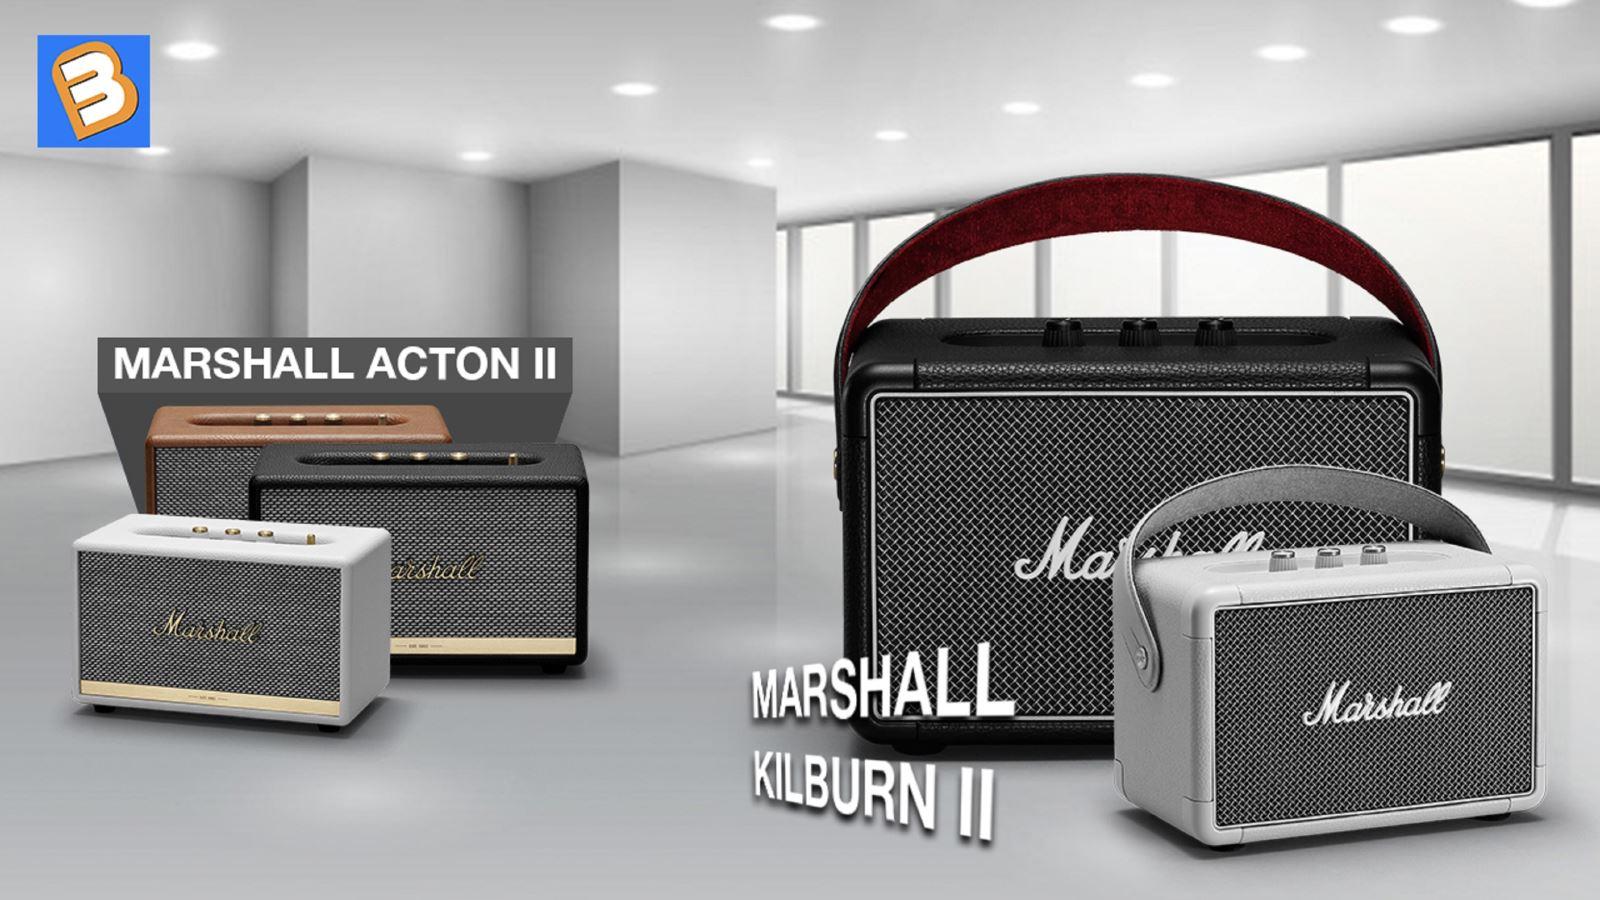 Marshall Acton IIvớiMarshall Kilburn II: Nên mua loa nào?